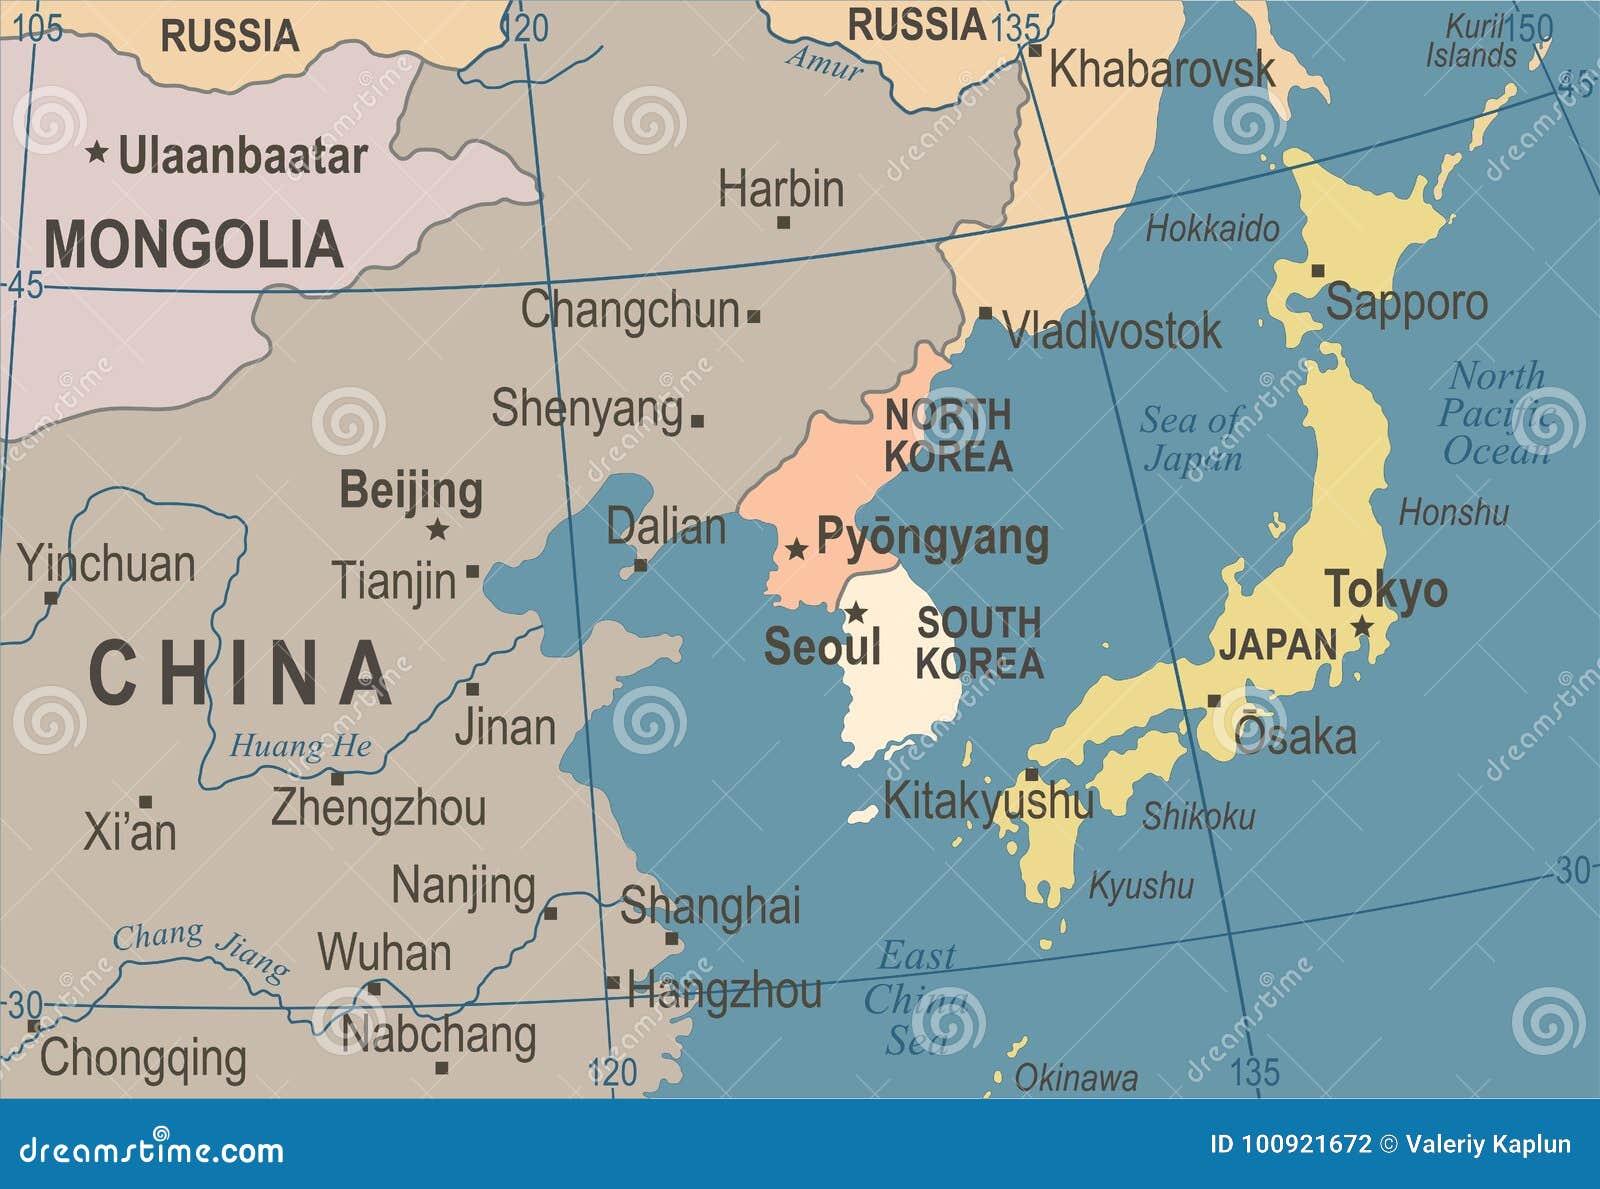 North korea south korea japan china russia mongolia map vintage download north korea south korea japan china russia mongolia map vintage vector illustration stock illustration gumiabroncs Images